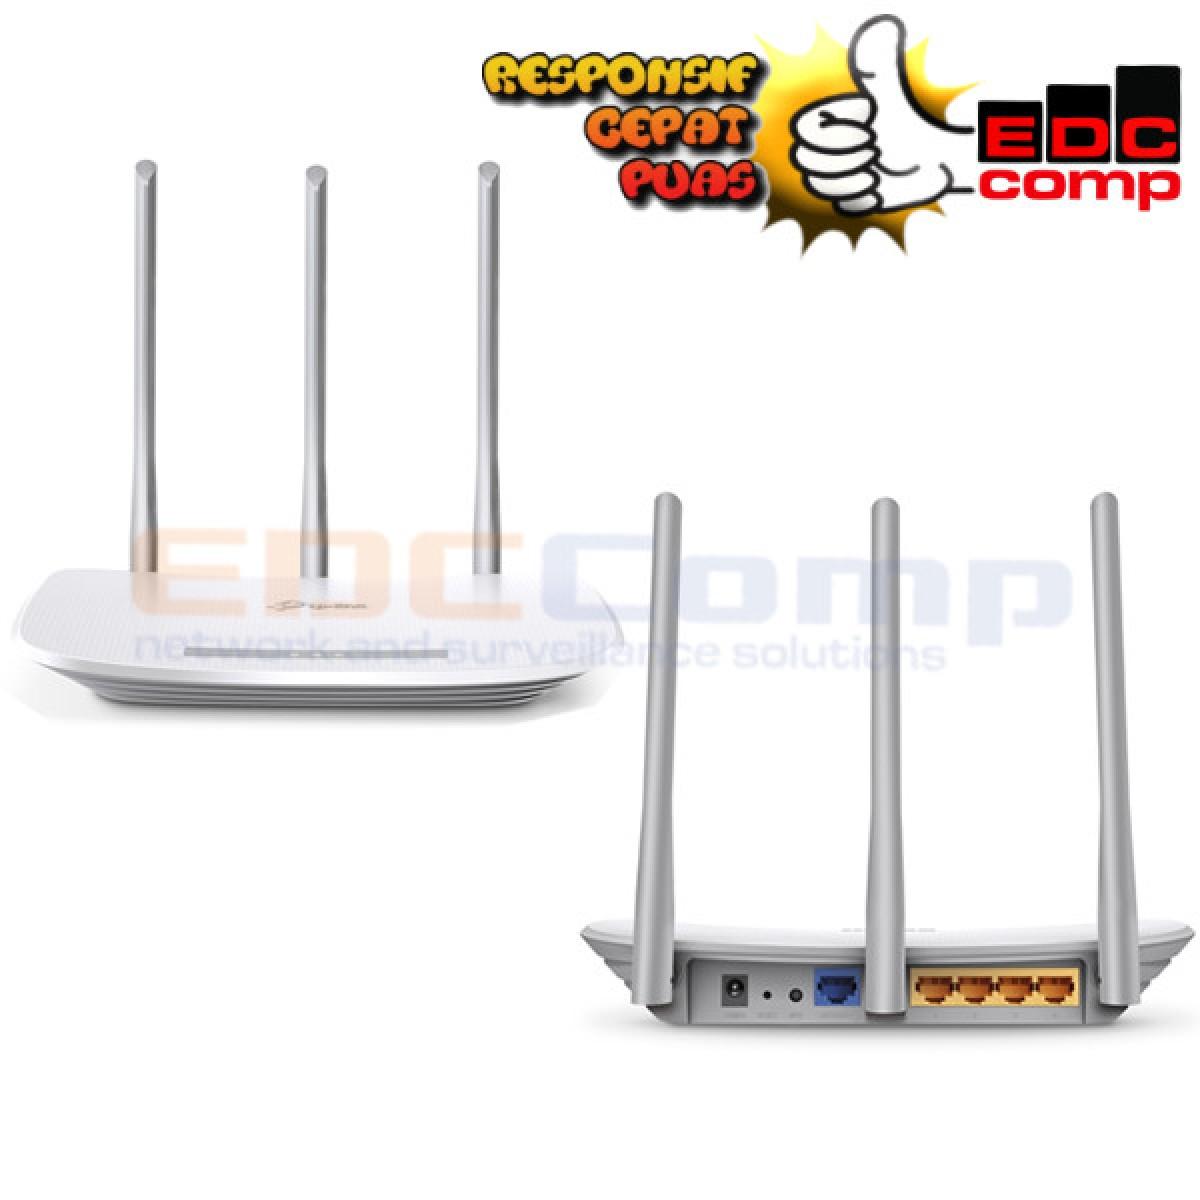 TP-LINK TL-WR845N / TL WR845N (3 Antena) 300MBps Wireless Router - EdcComp